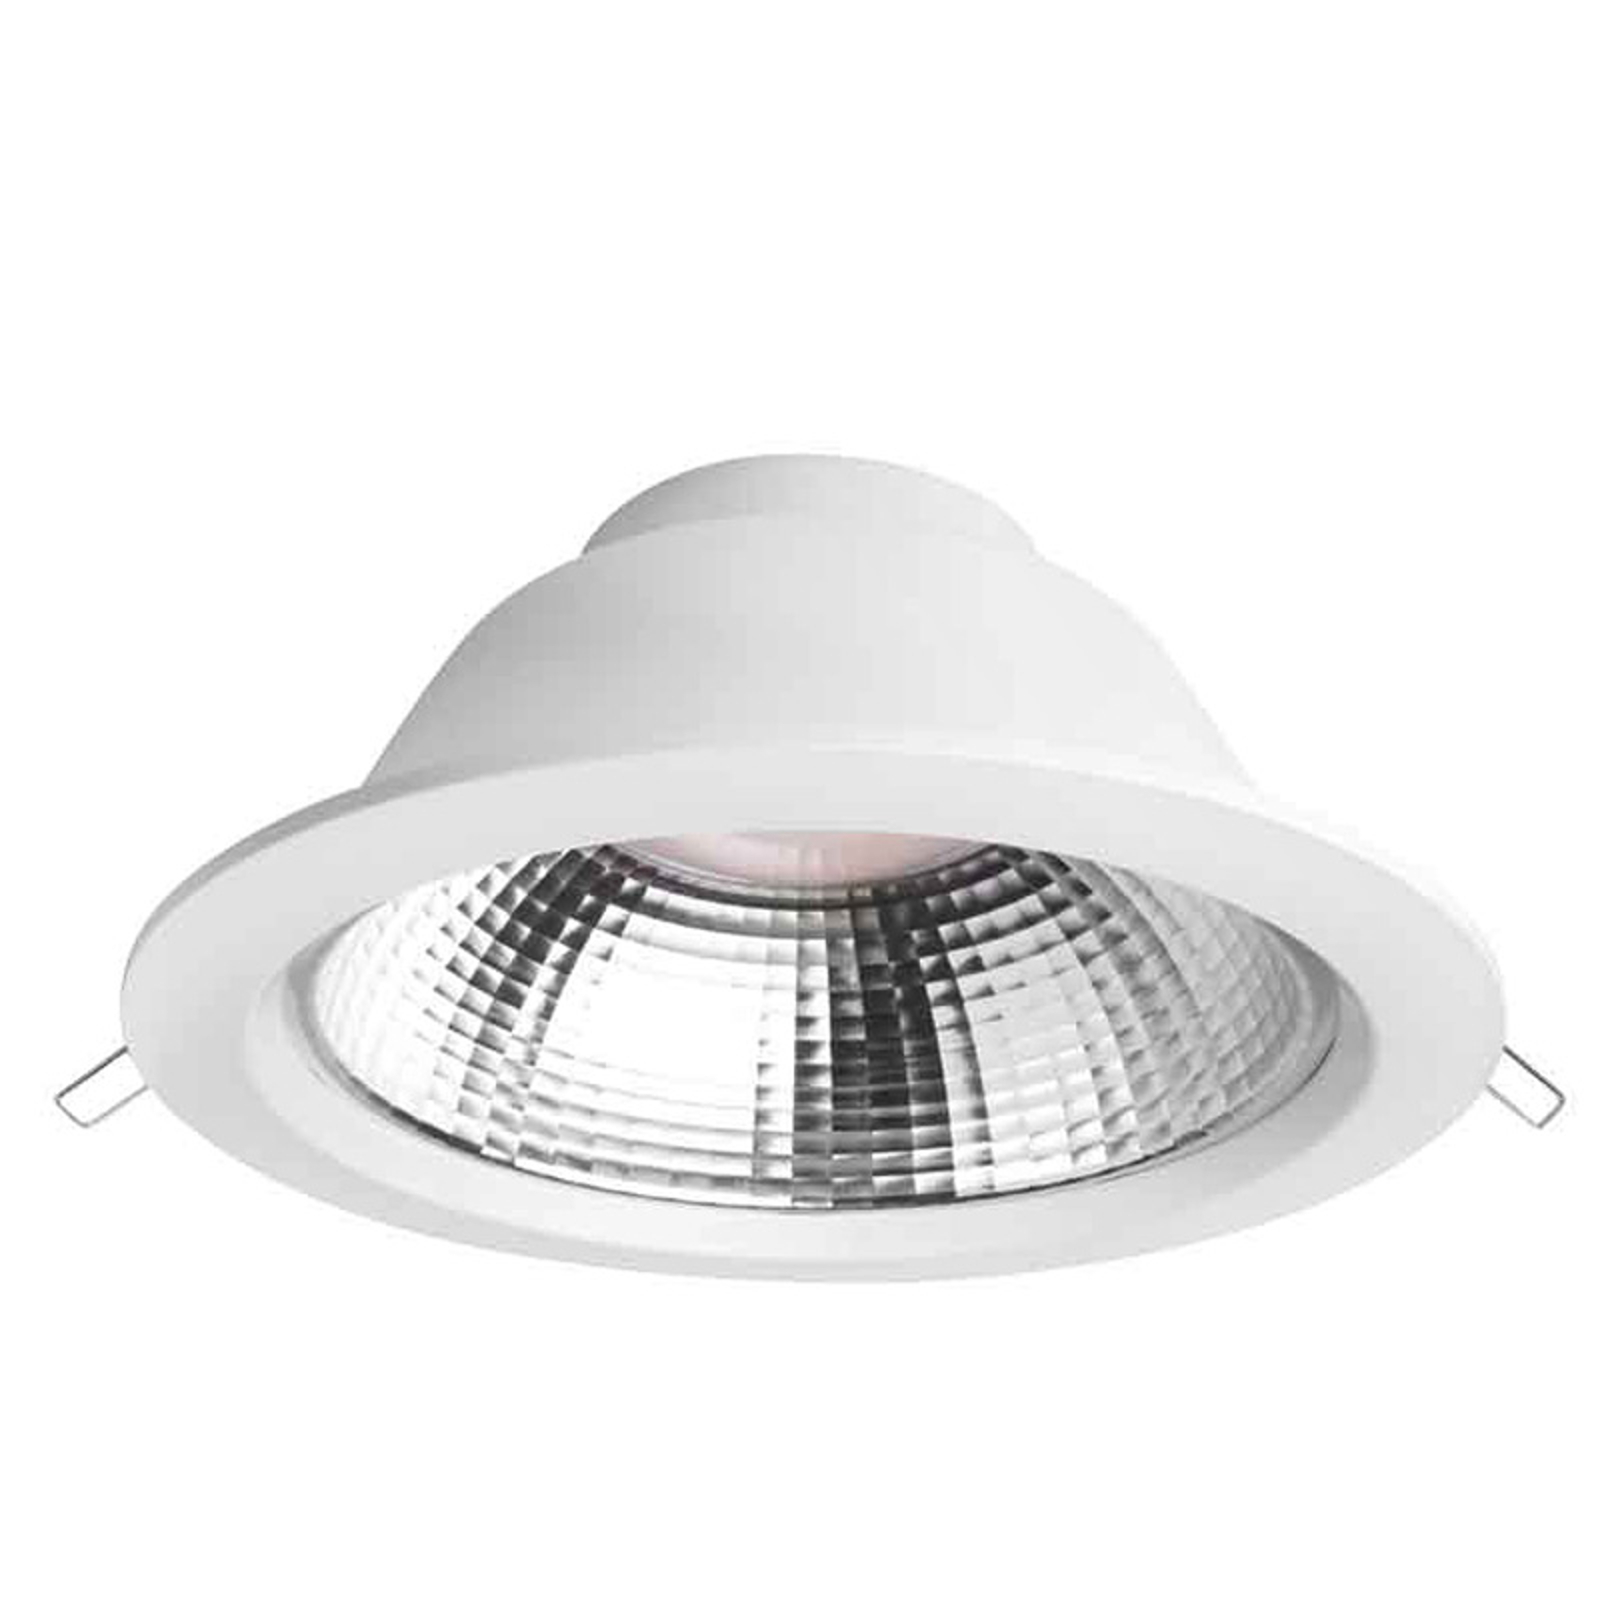 Siena LED-downlight lyssterk 19W